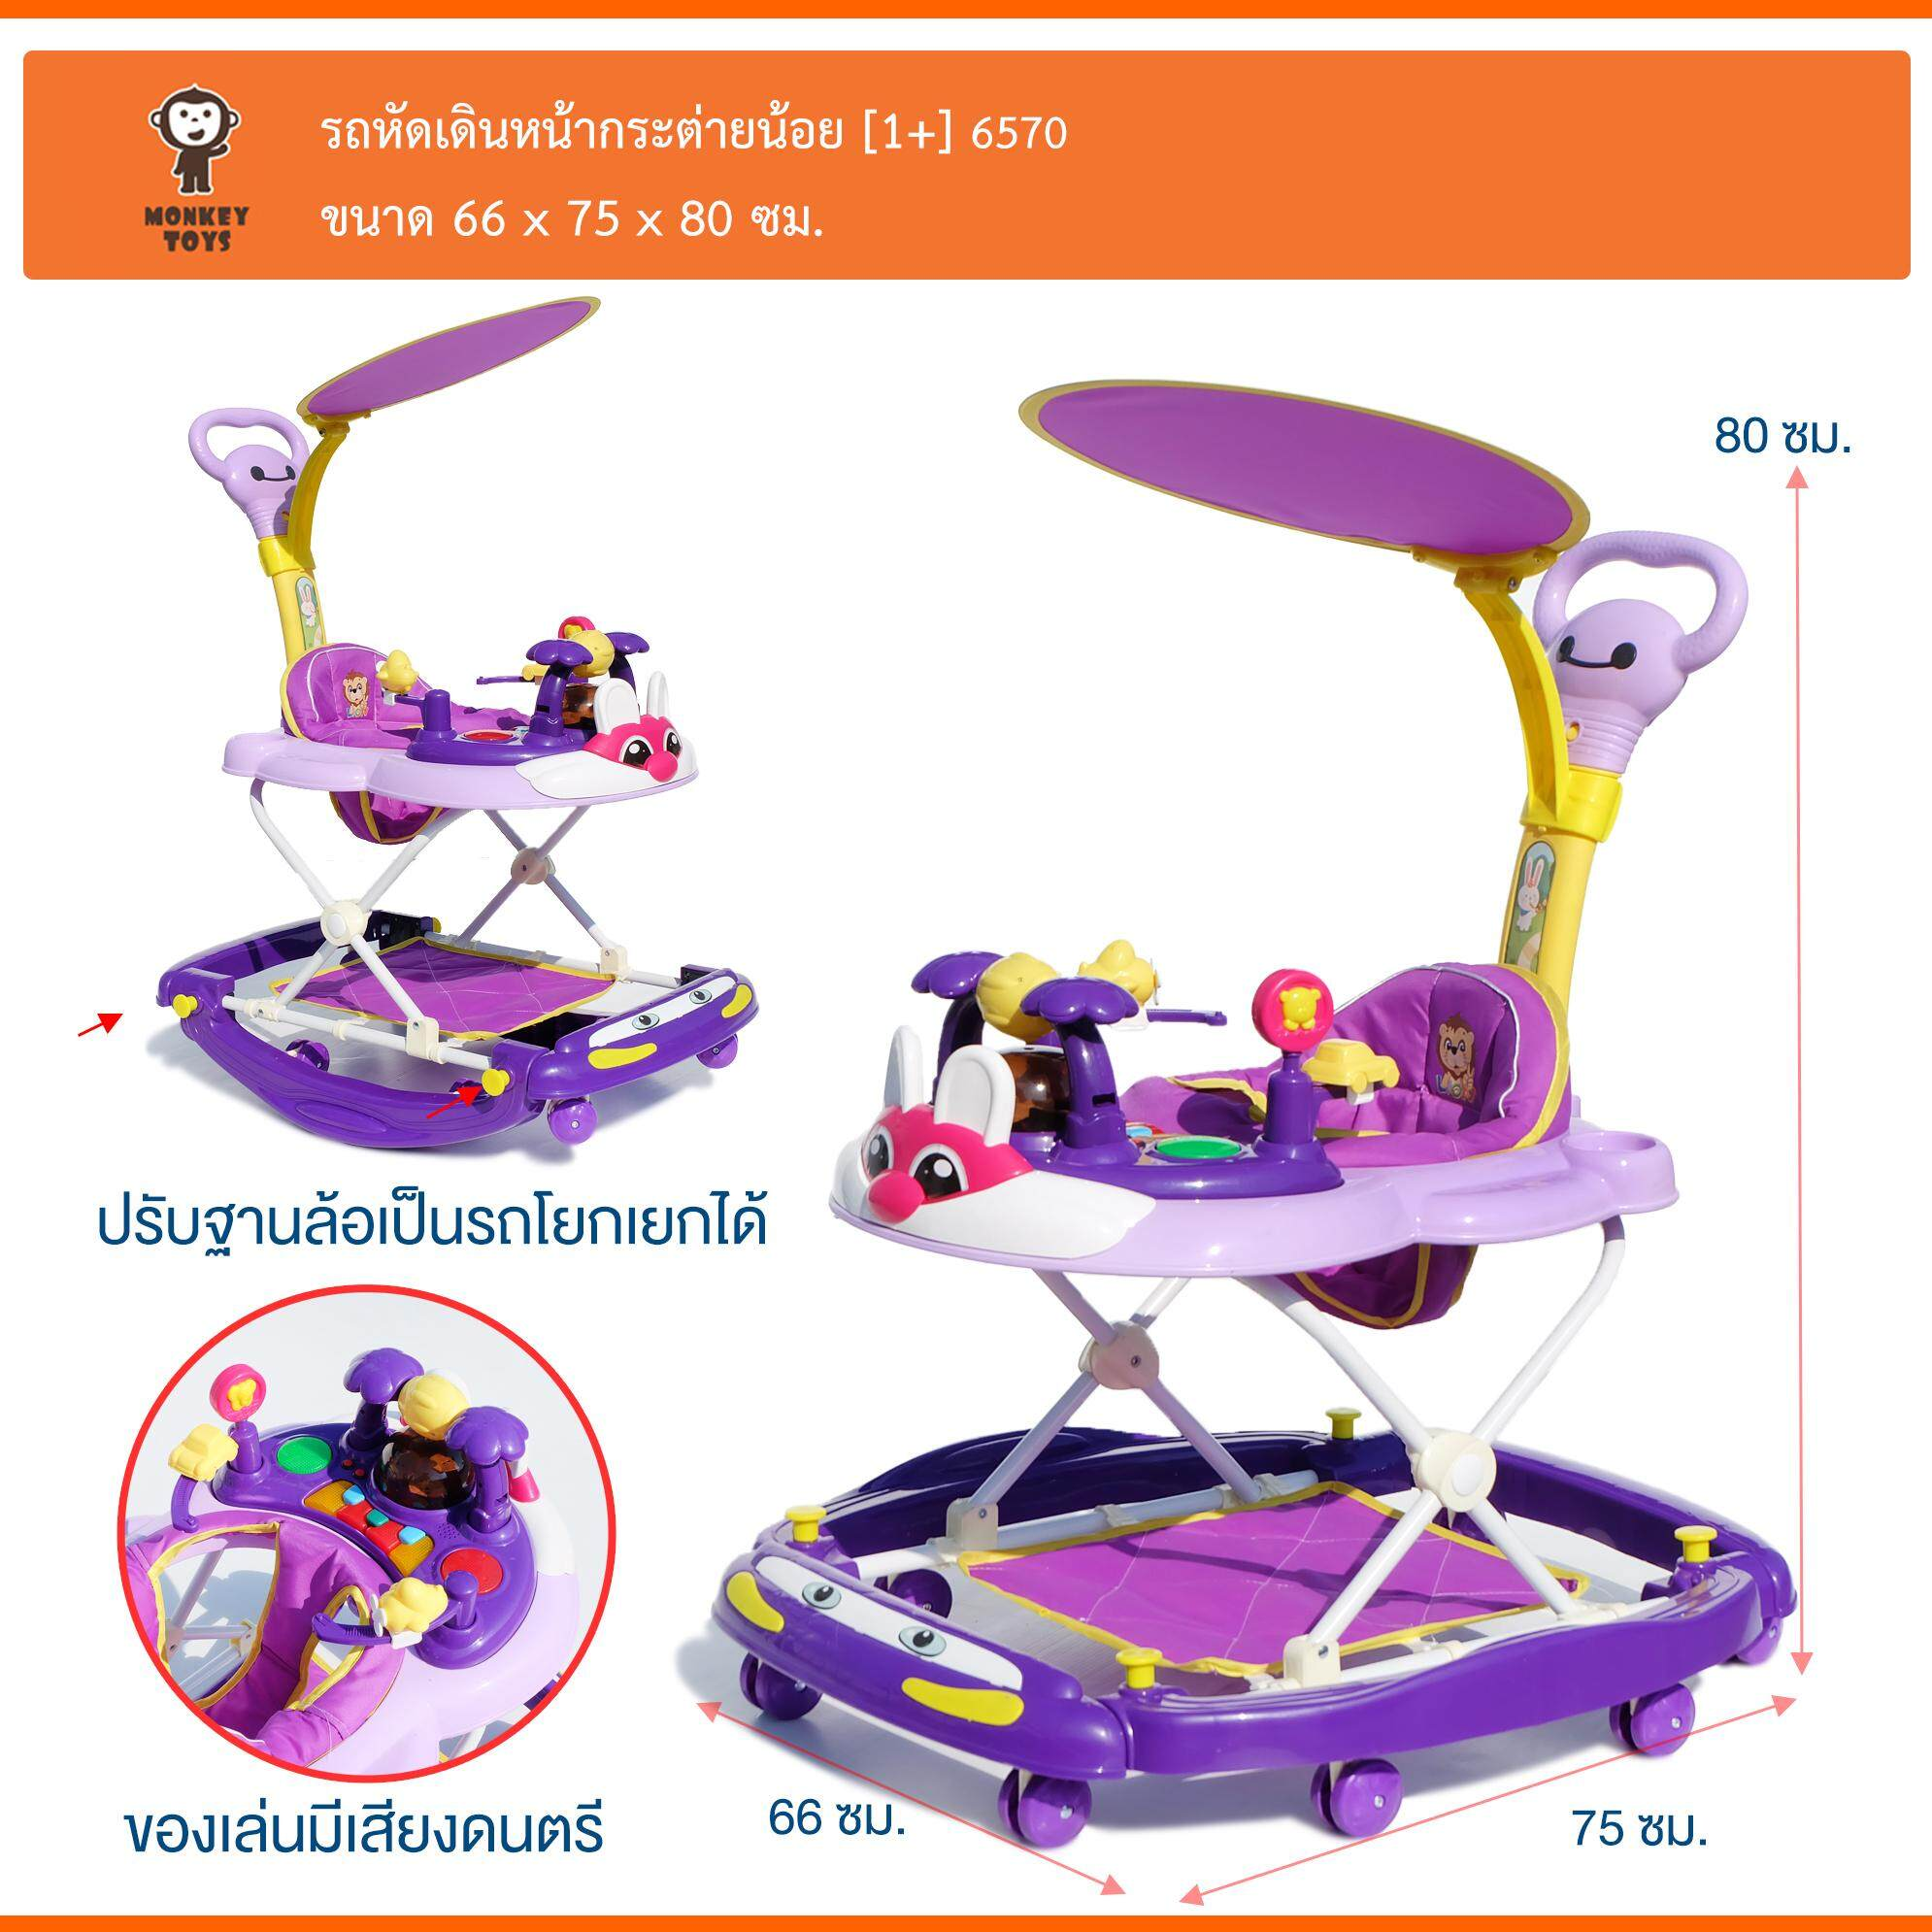 Monkey Toys รถหัดเดิน กระรอก ด้ามเข็นปรับโยก 2in1 5001 6570